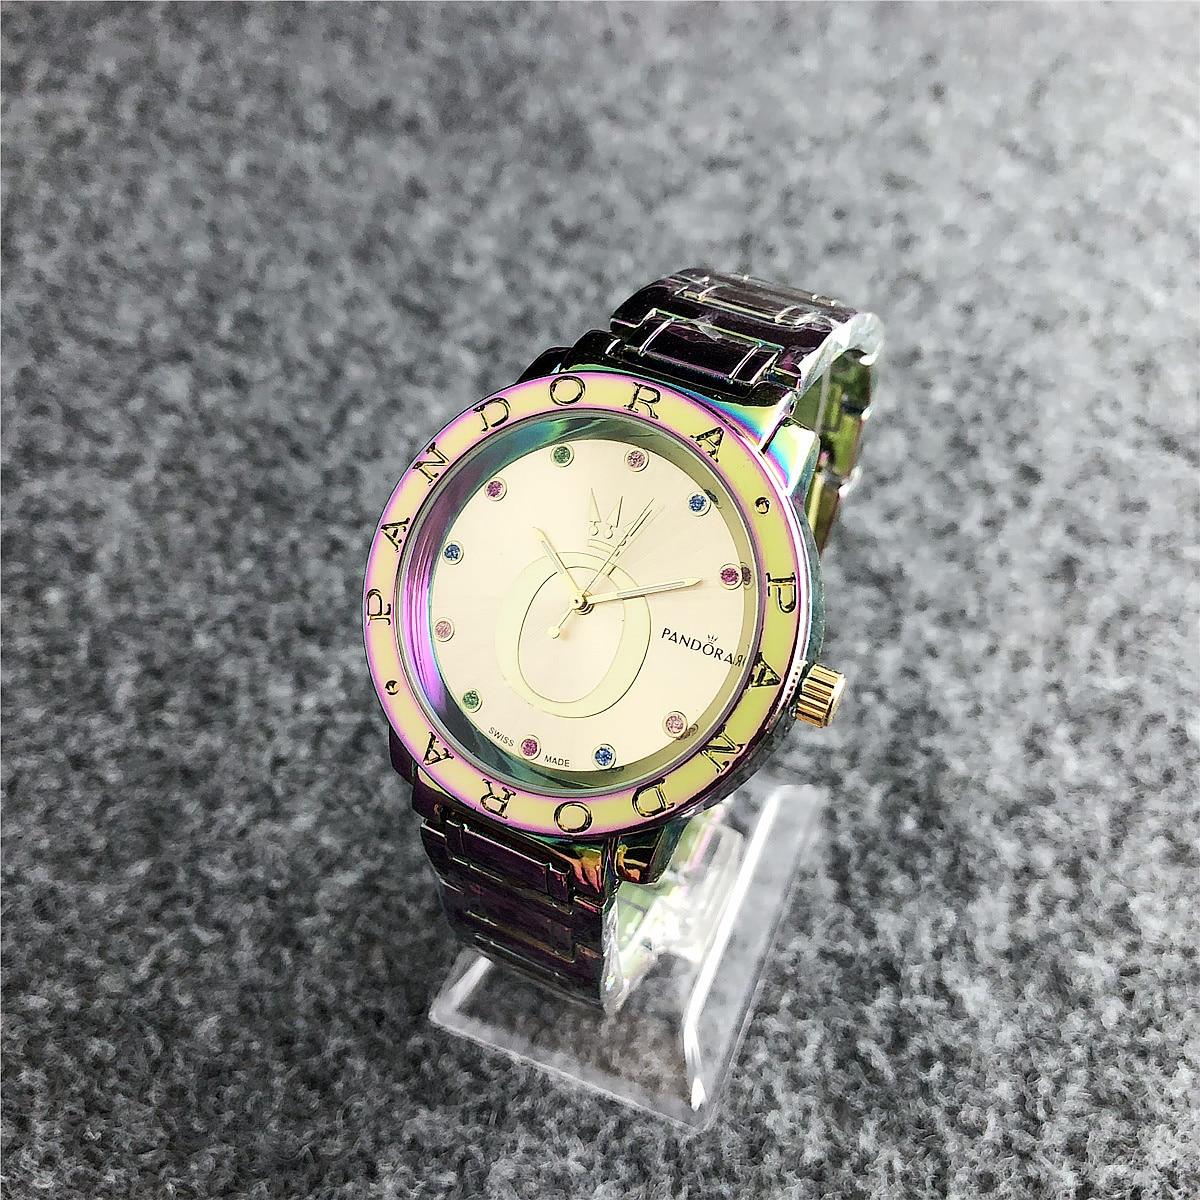 Women Pandoraes Bracelet Charms Silver 925 Original Pandoraes Watch Luxury Ladies Watches For Women Reloj Mujer Saat Relogio